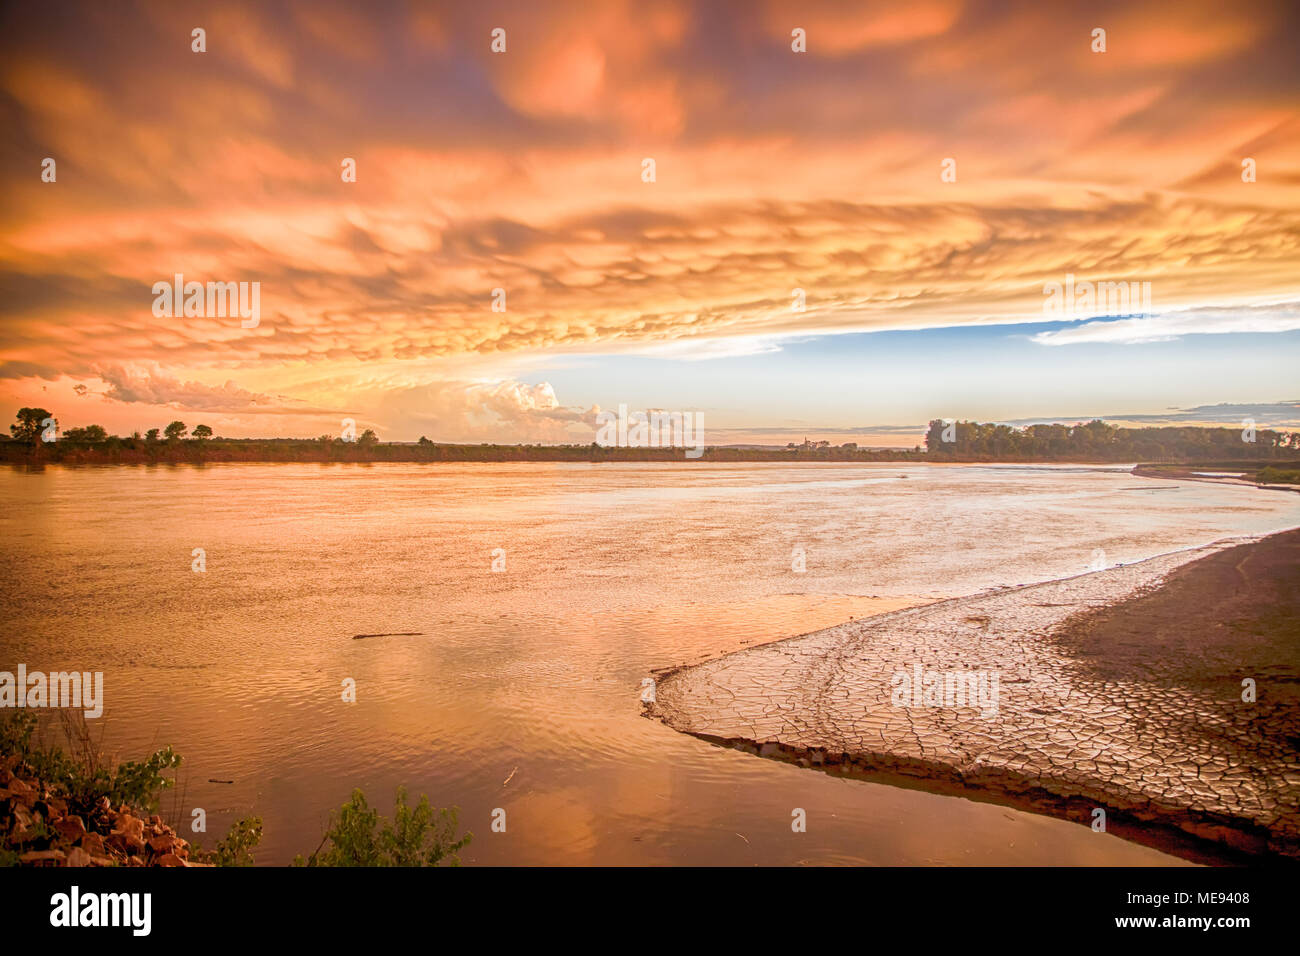 Brewing storm and turbulent skies make for a beatiful scene on the Missouri River, Dakota Dunes - Stock Image